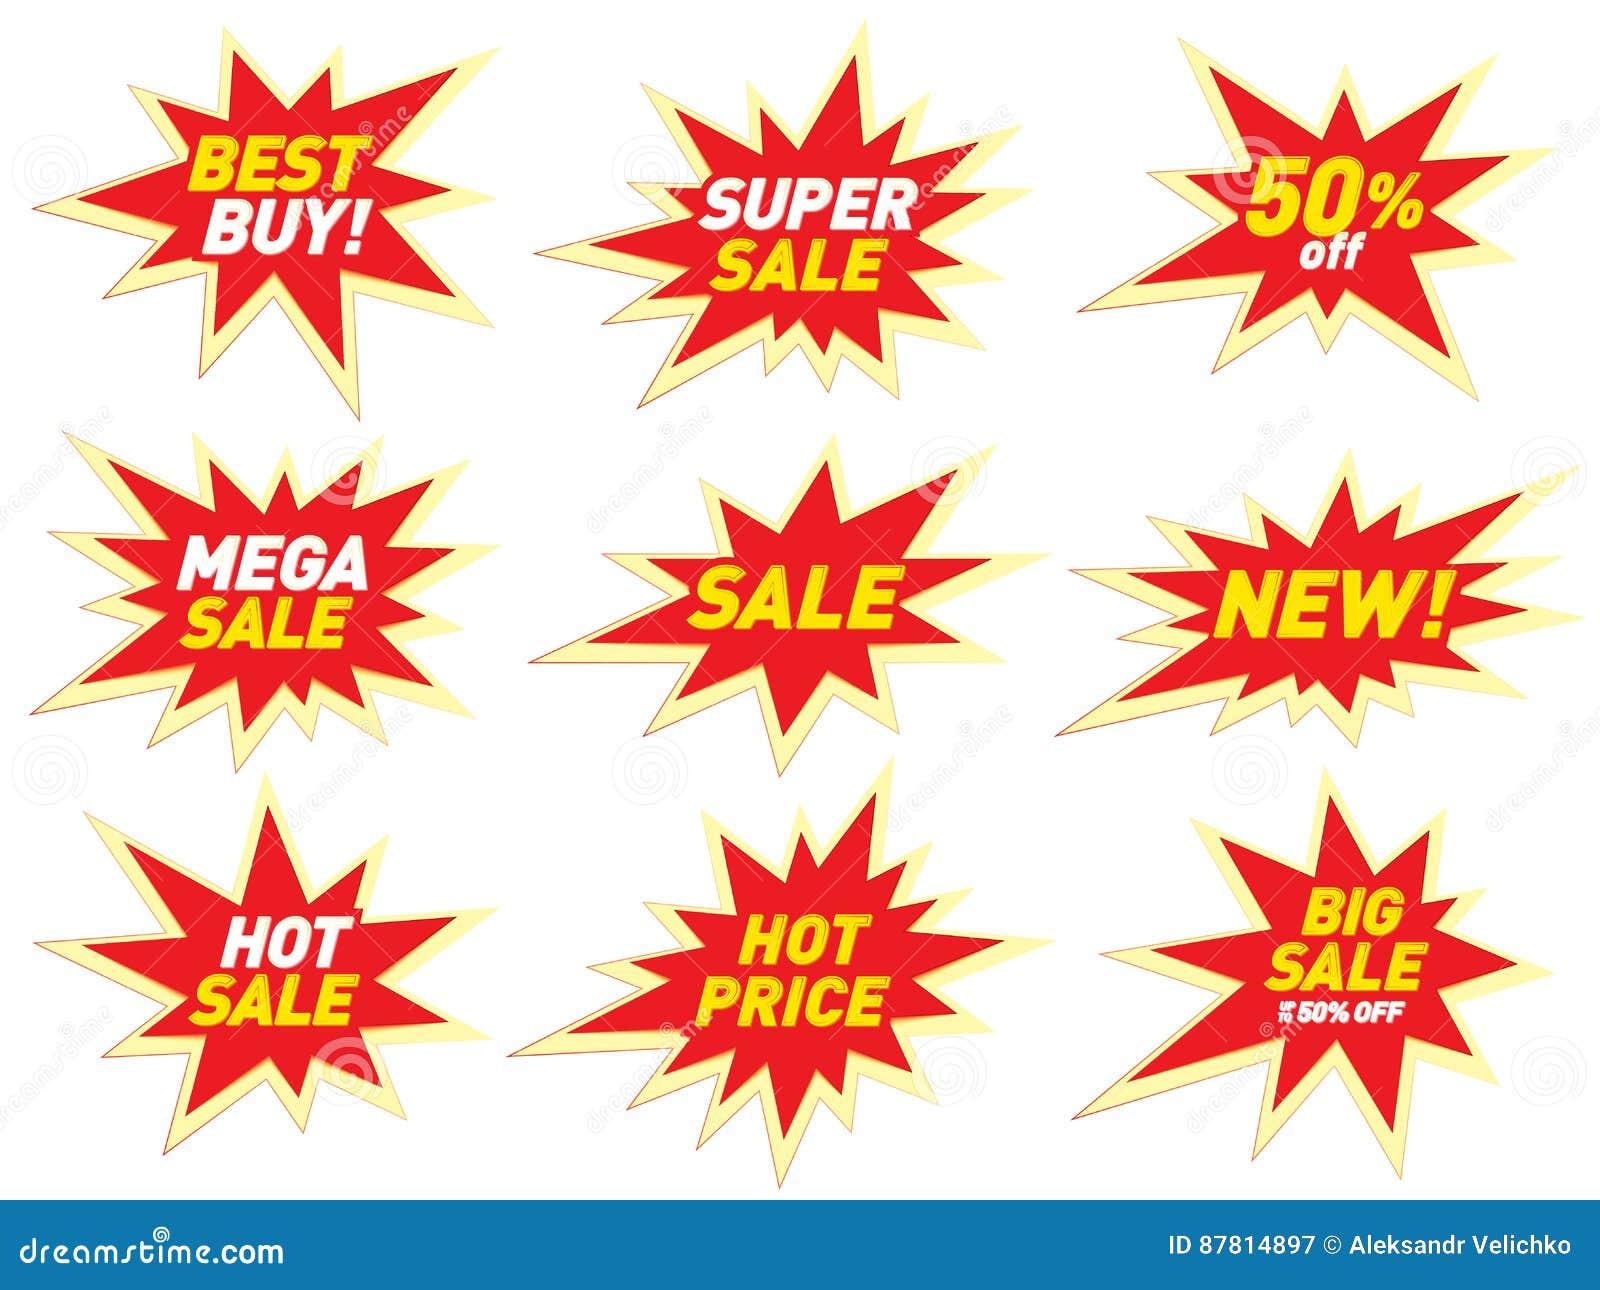 Sale label price tag banner star badge template sticker design.